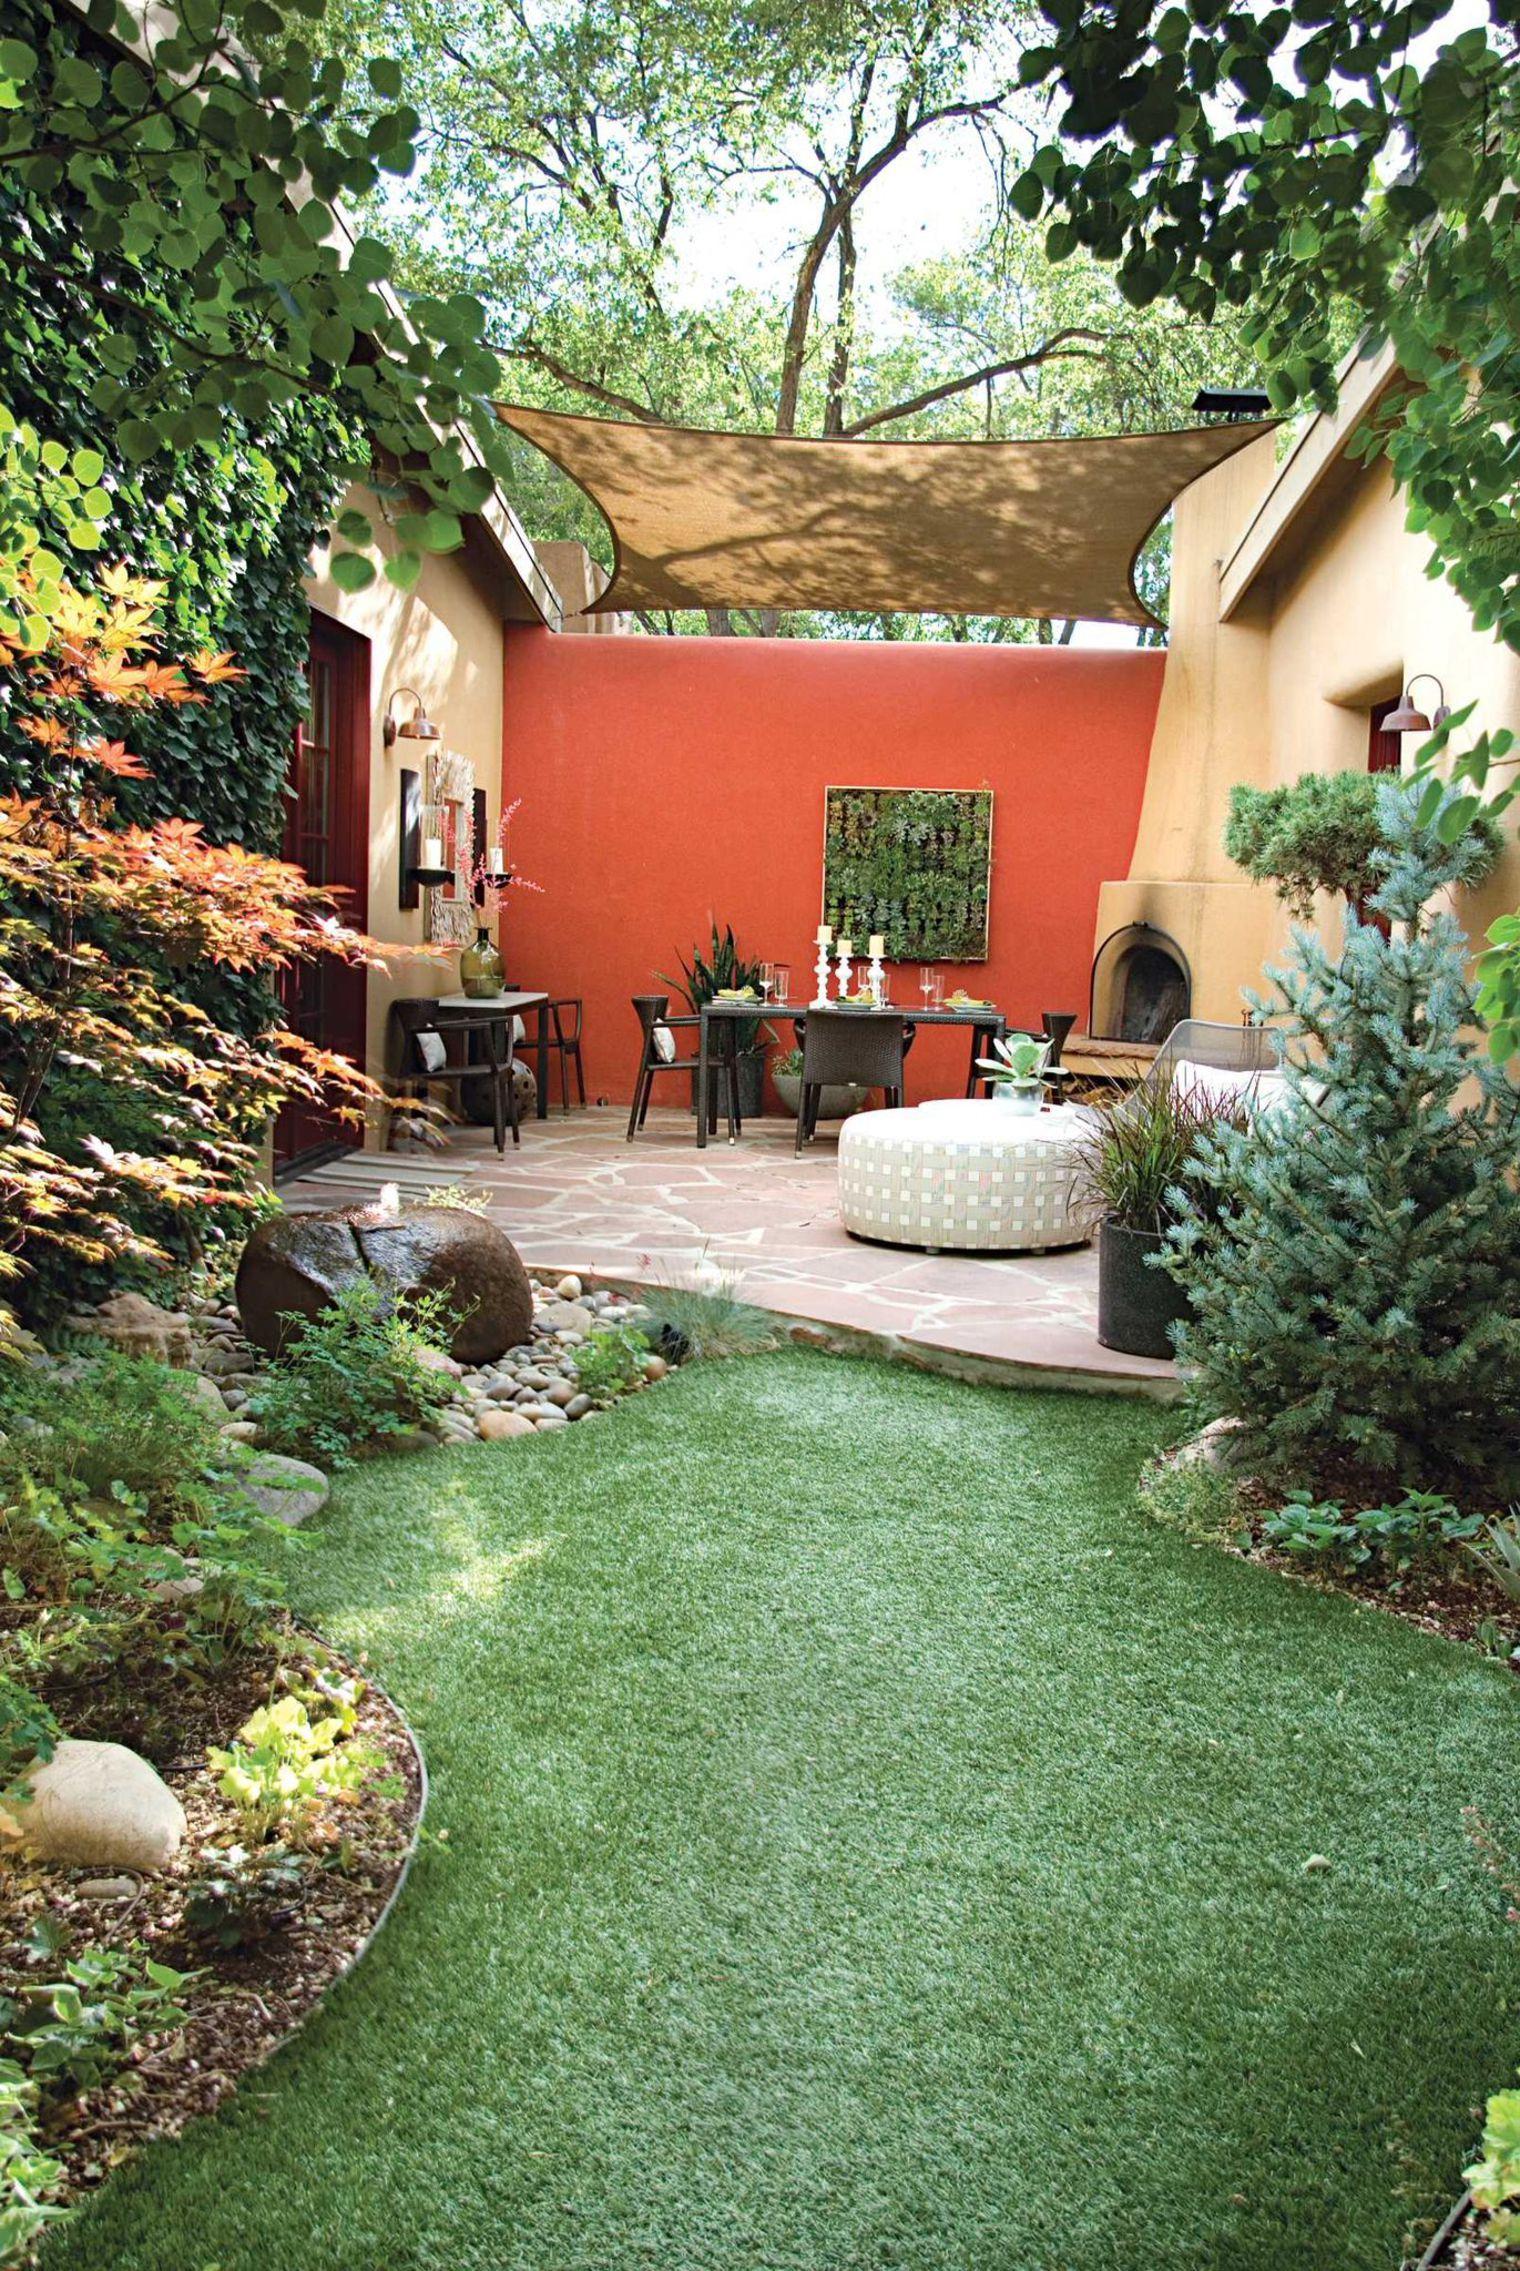 Petit Jardin : 8 Aménagements Repérés Sur Pinterest ... concernant Amenagement Petit Jardin Mediterraneen